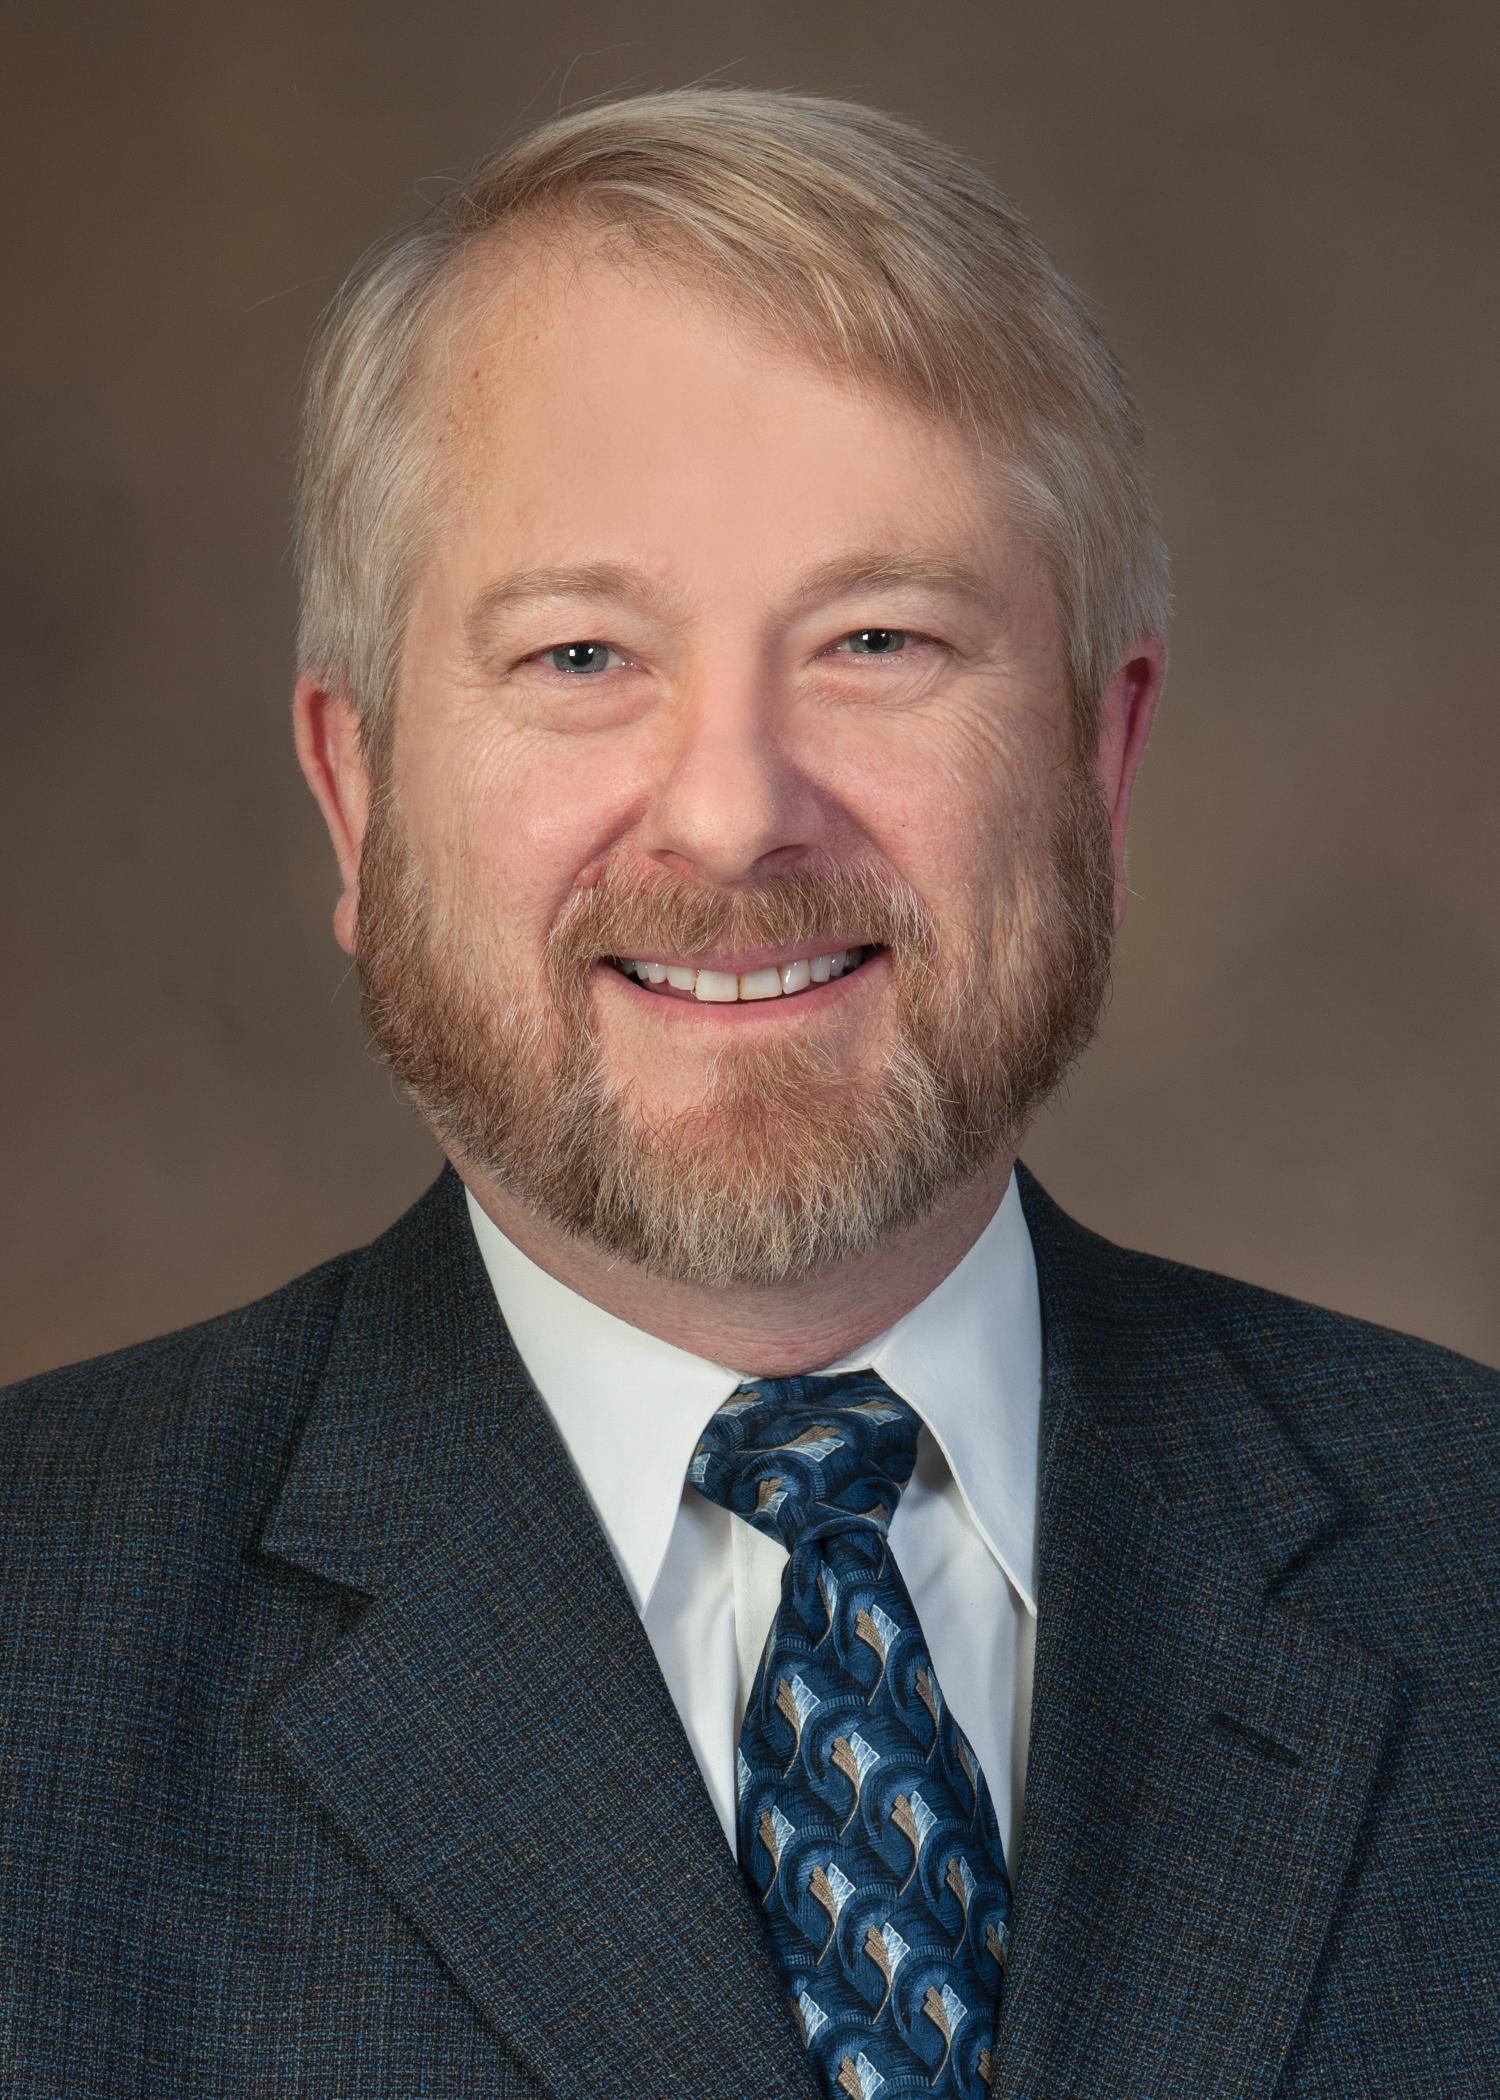 Daniel Derksen, MD